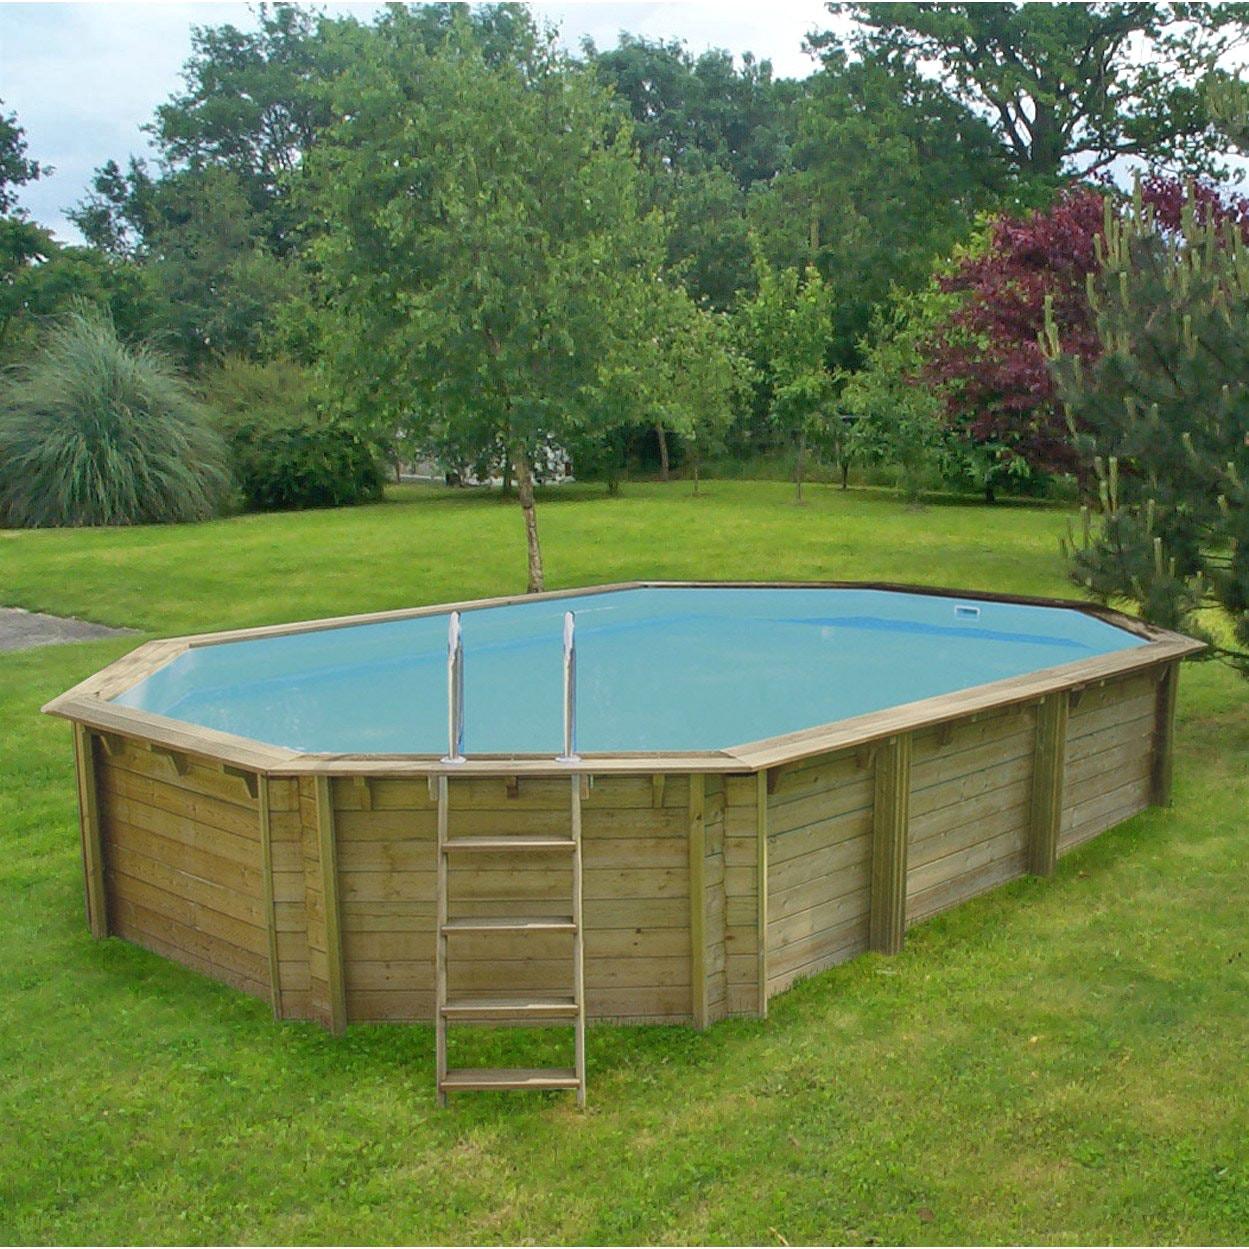 bache piscine rectangulaire leroy merlin. Black Bedroom Furniture Sets. Home Design Ideas